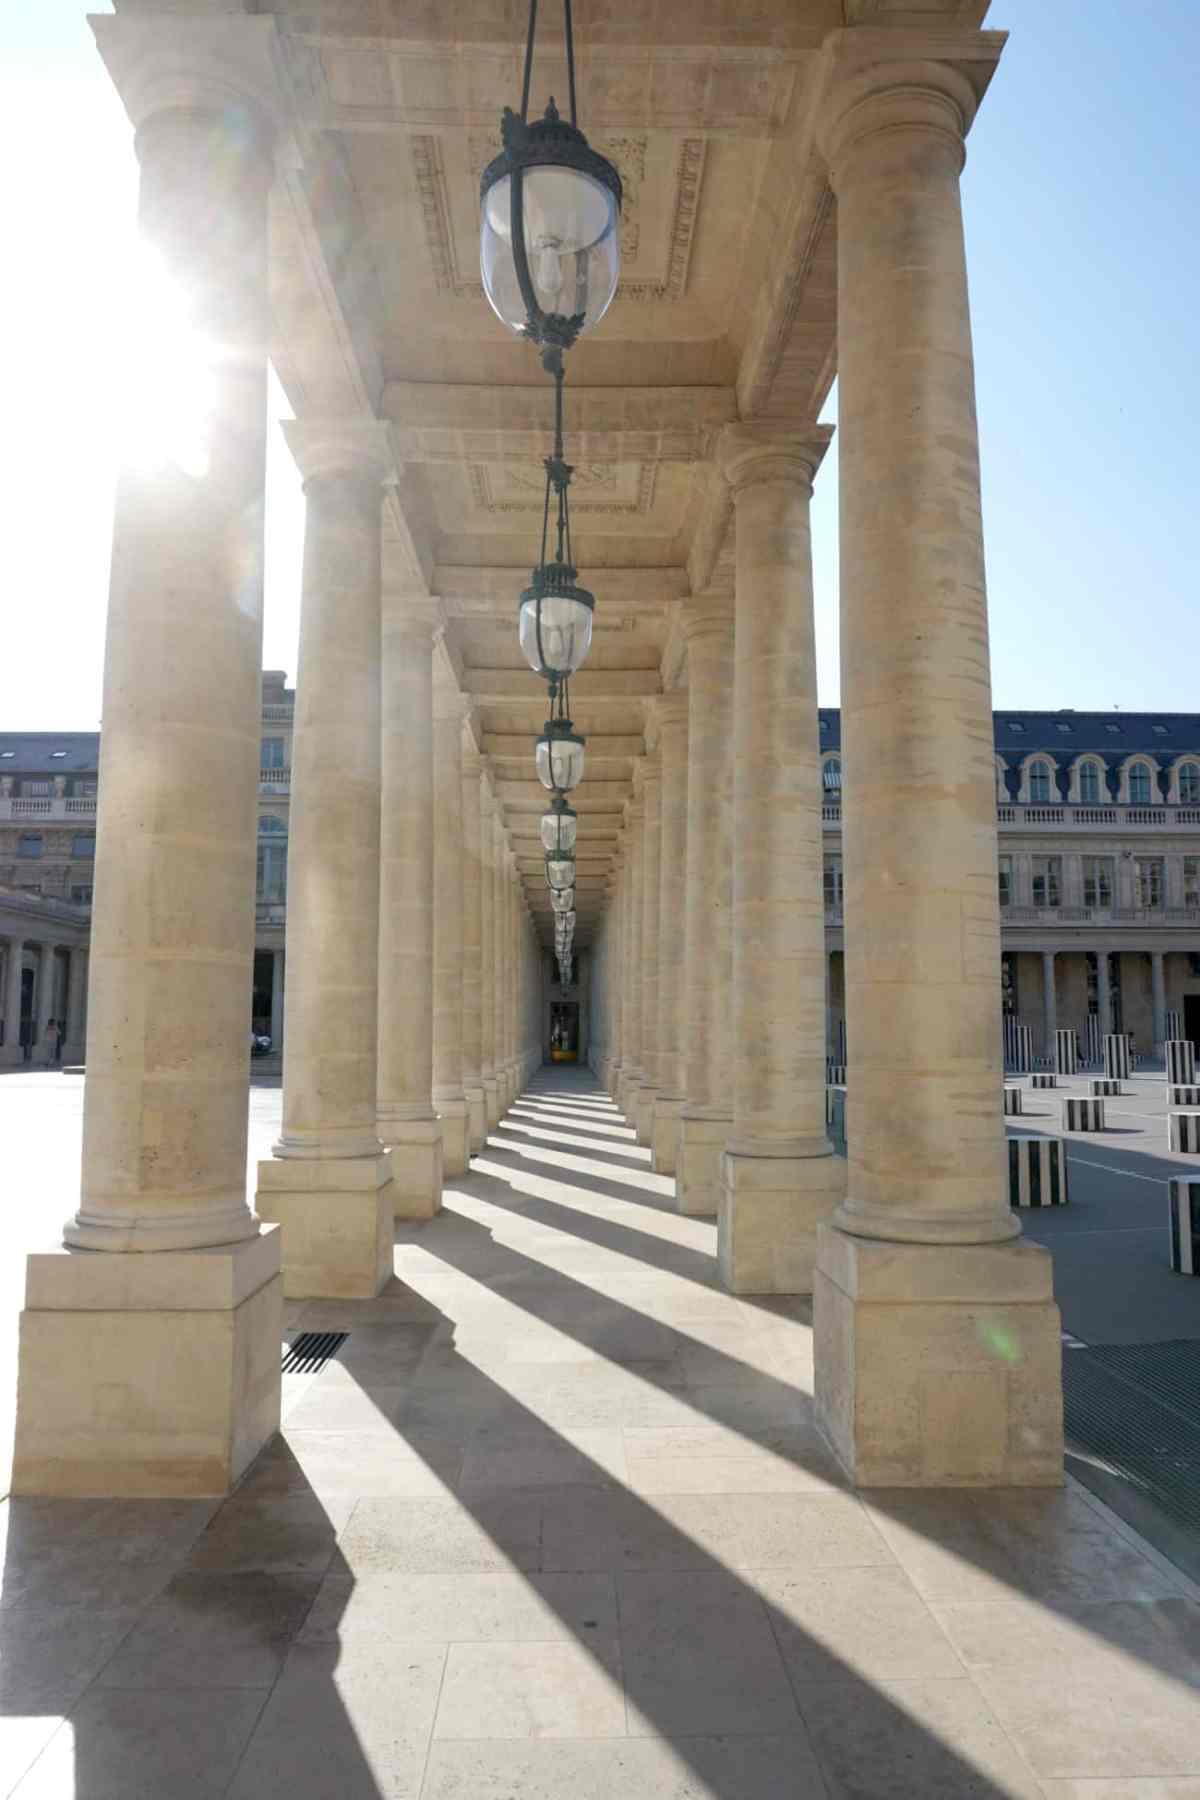 Paris I wit & whimsy